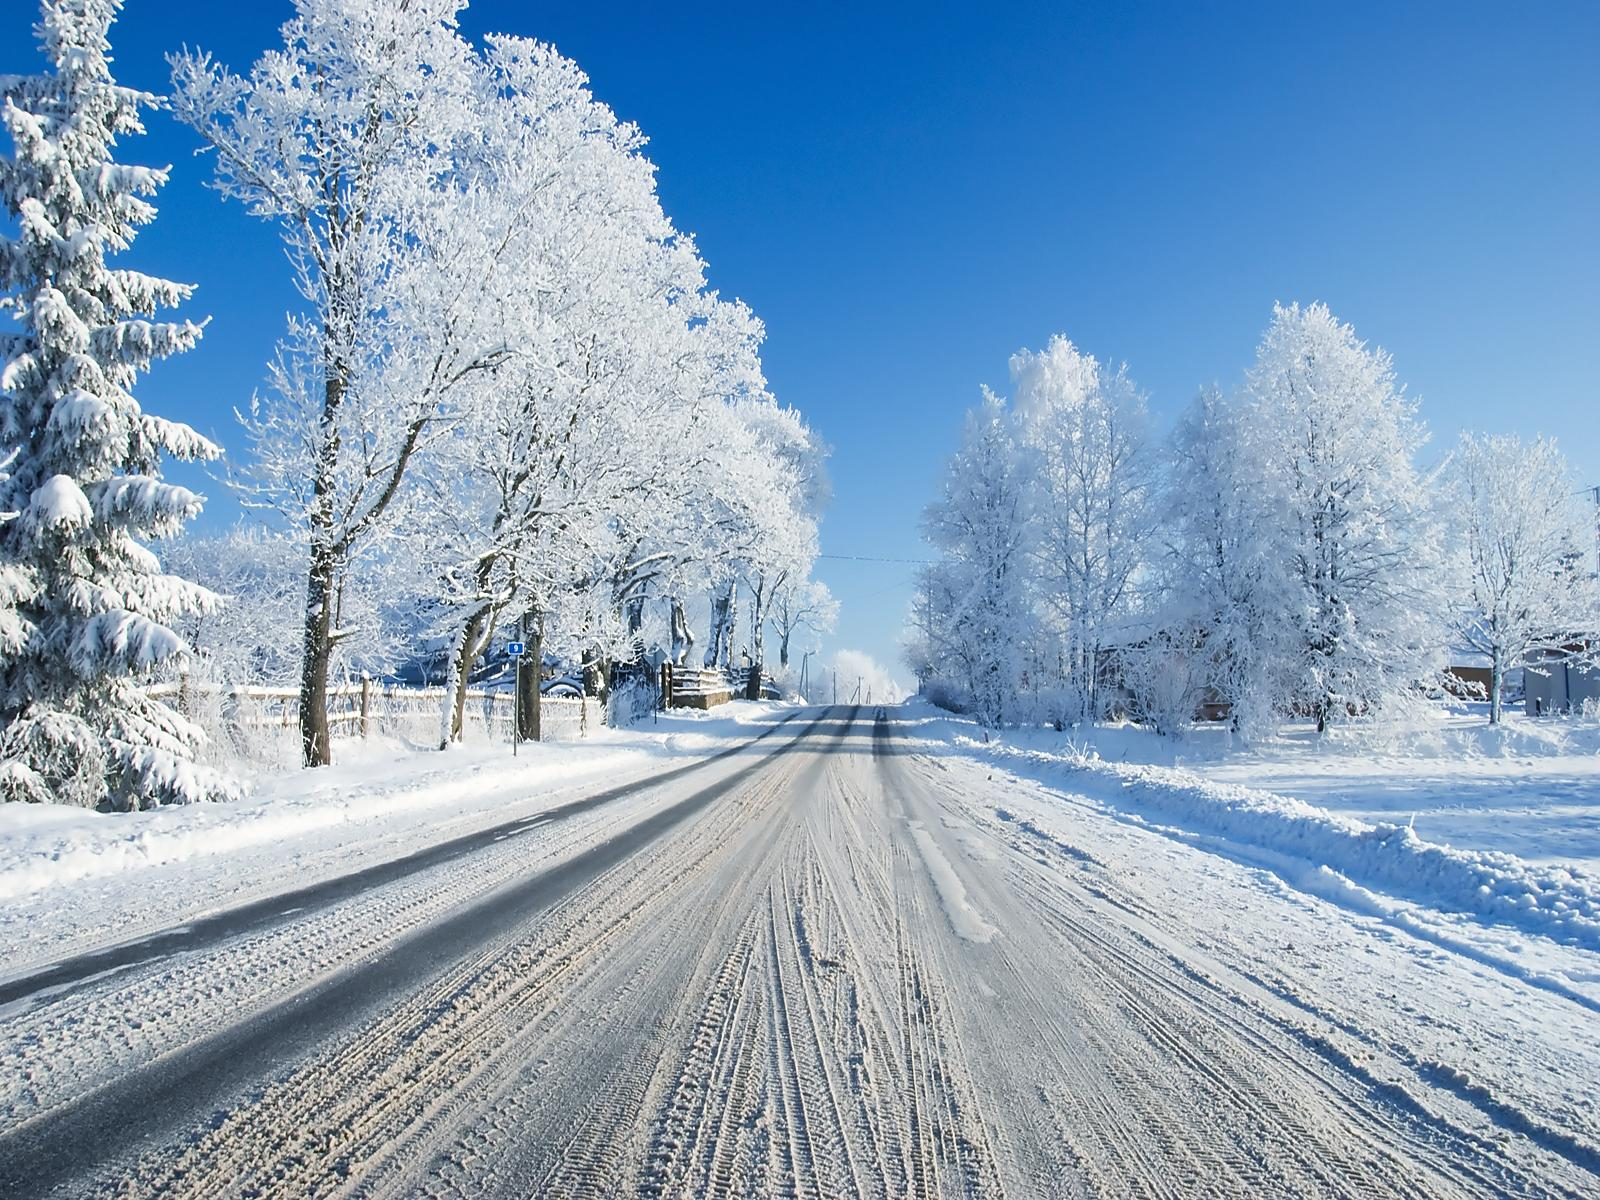 Beautiful Snowfall Season Wallpapers Warm Breath Feelings 1600x1200